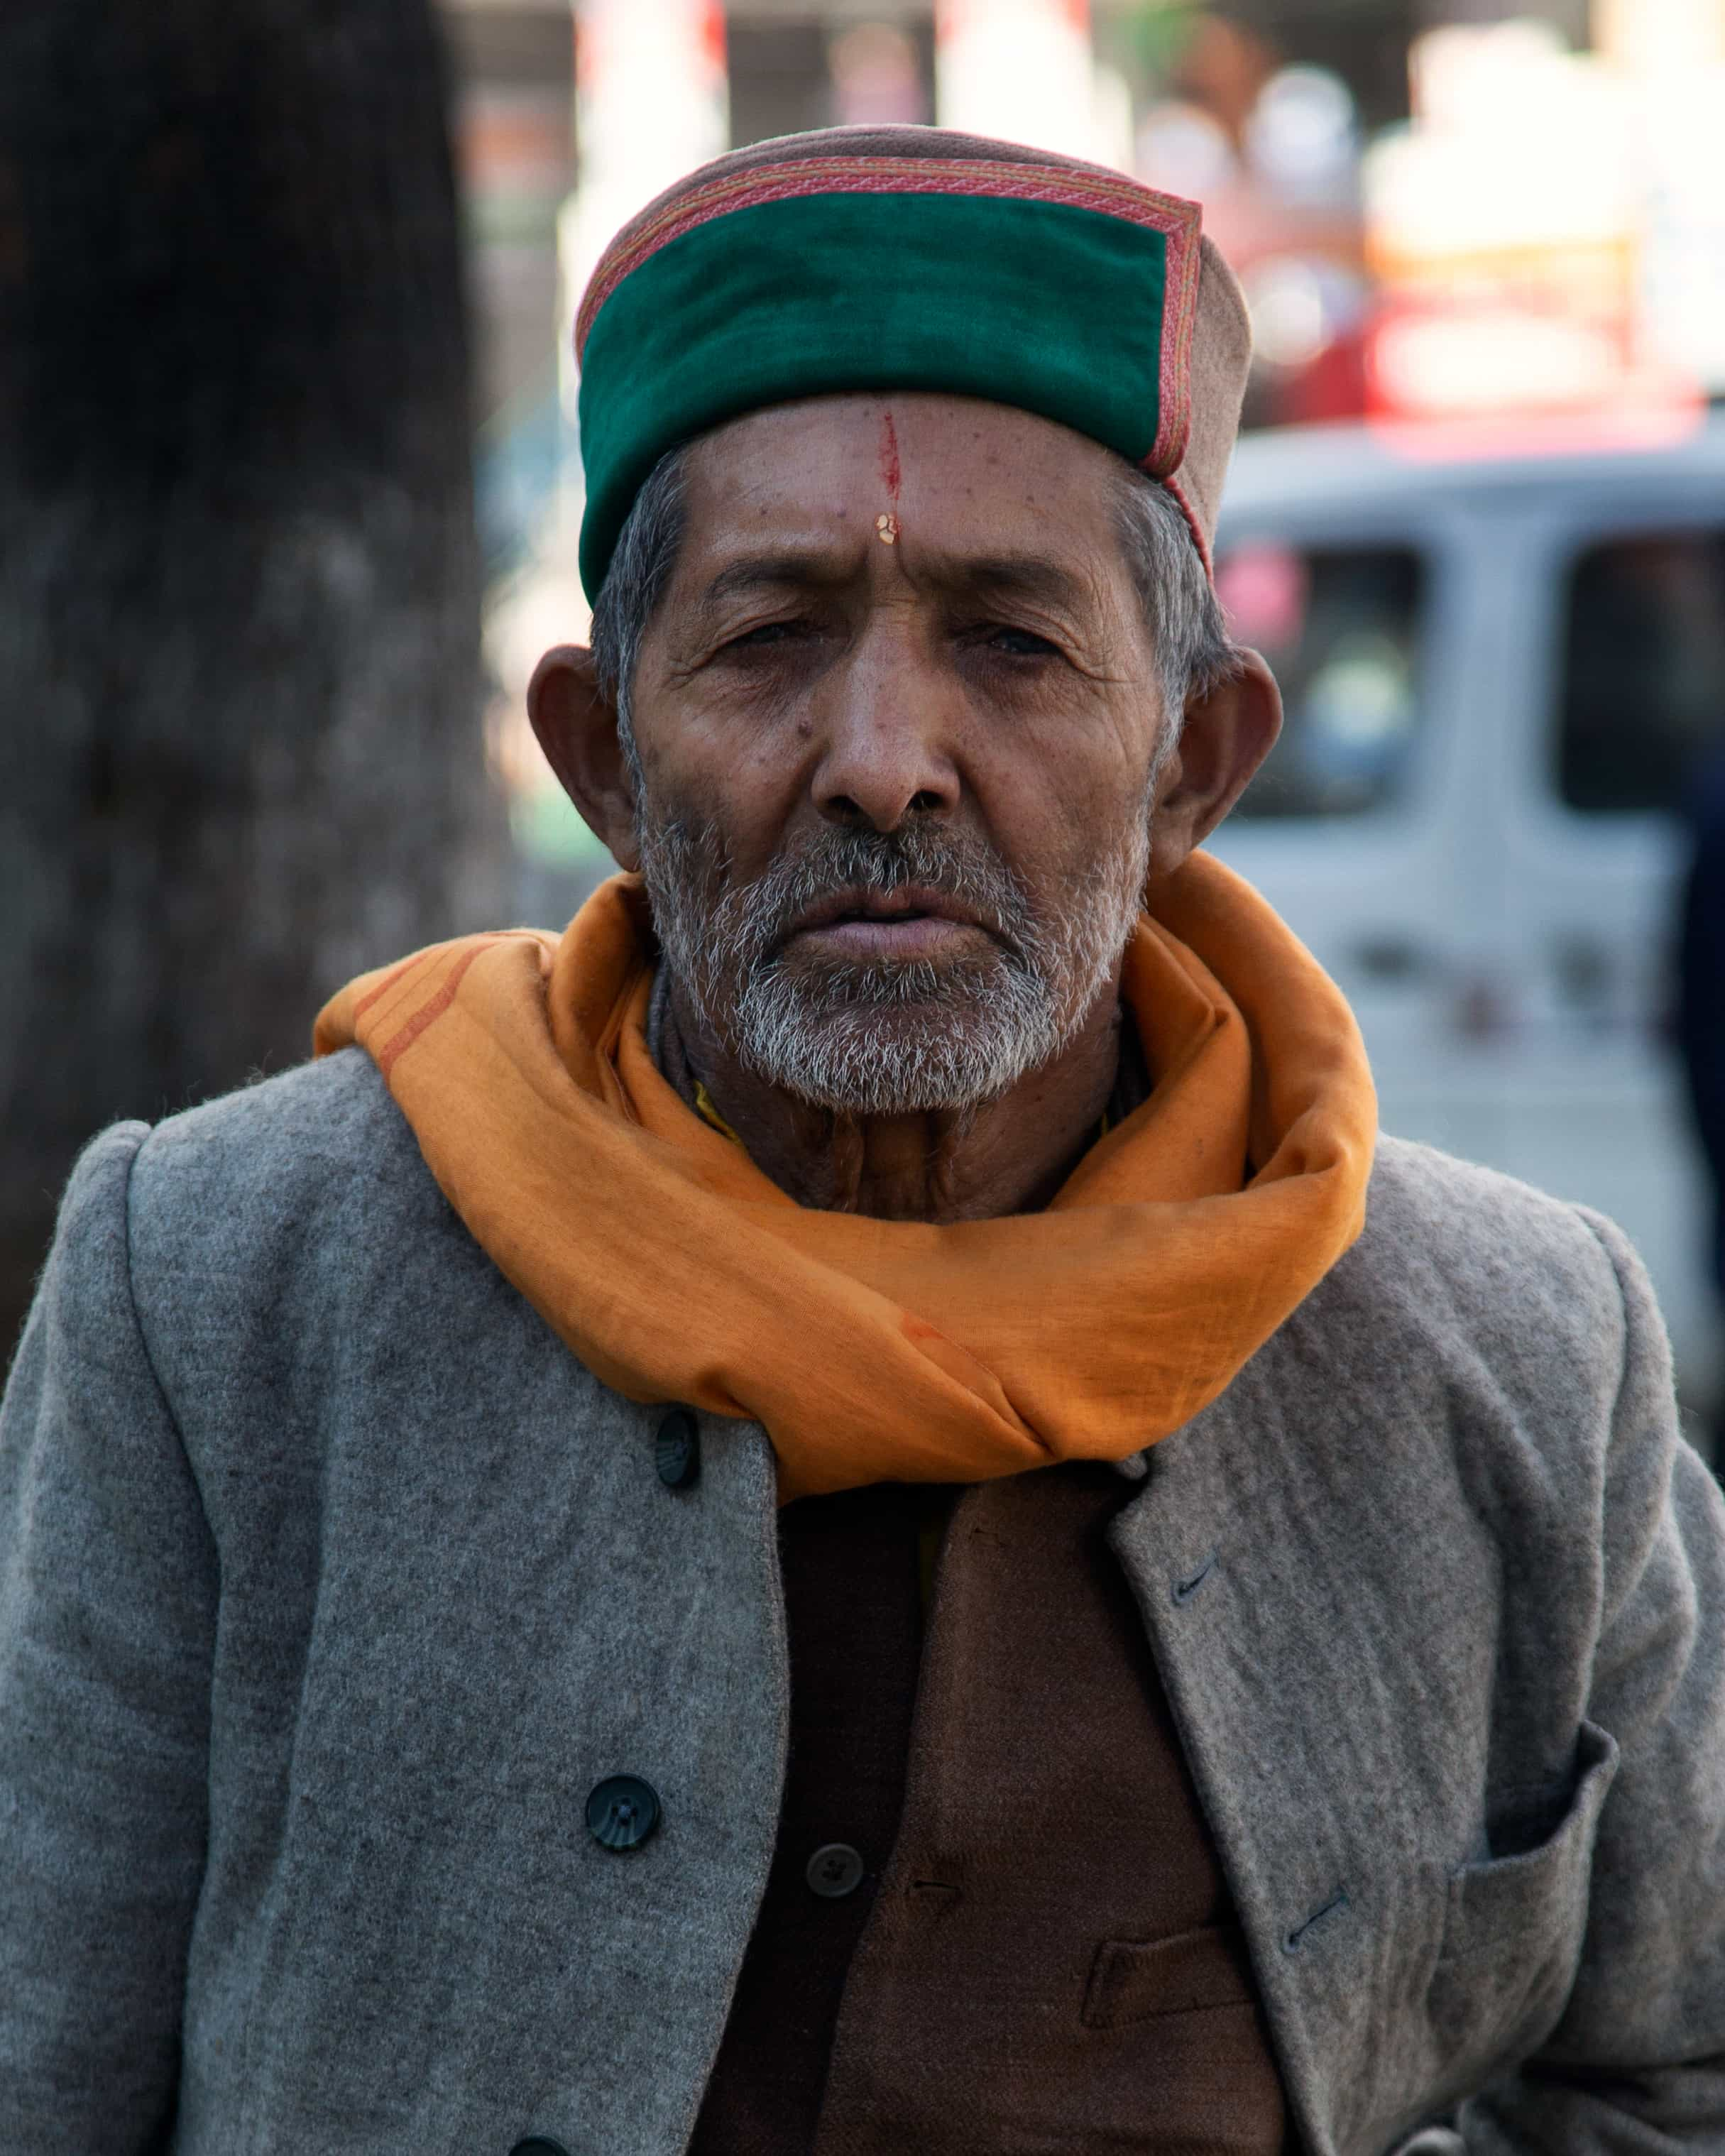 Green Hat Man